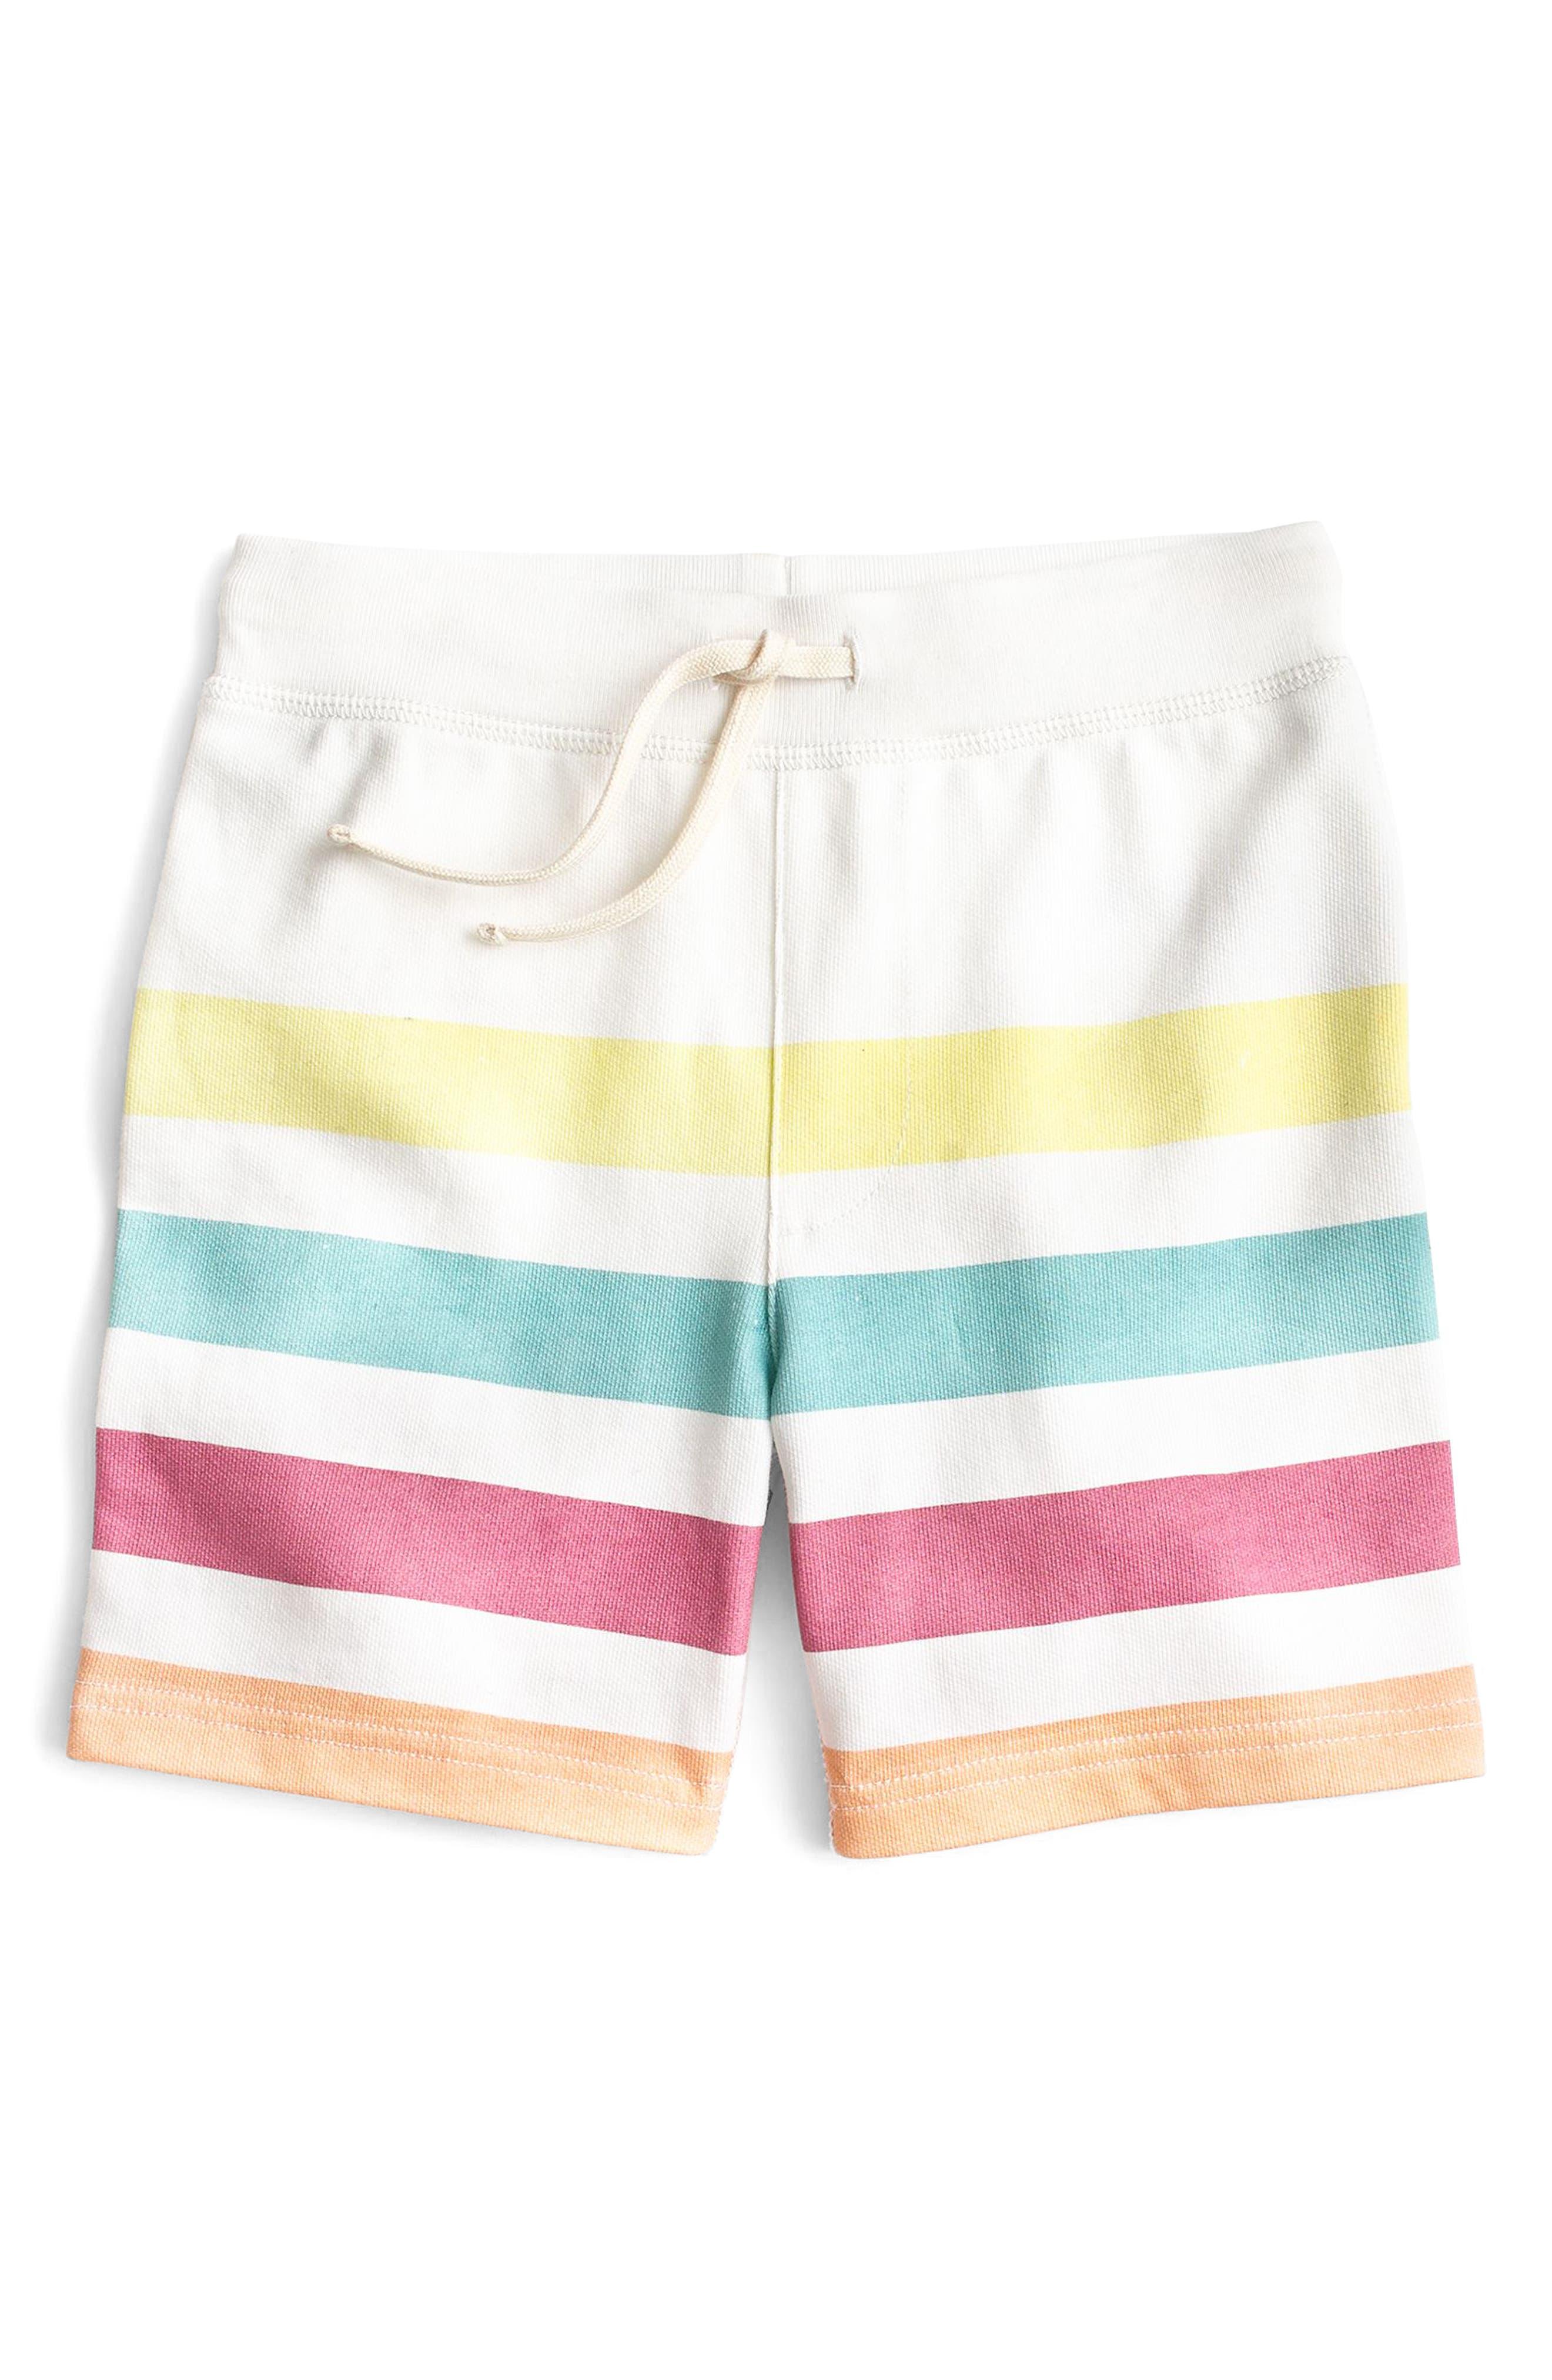 crewcuts by J.Crew Blanket Stripe Sweat Shorts (Toddler Boys, Little Boys & Big Boys)